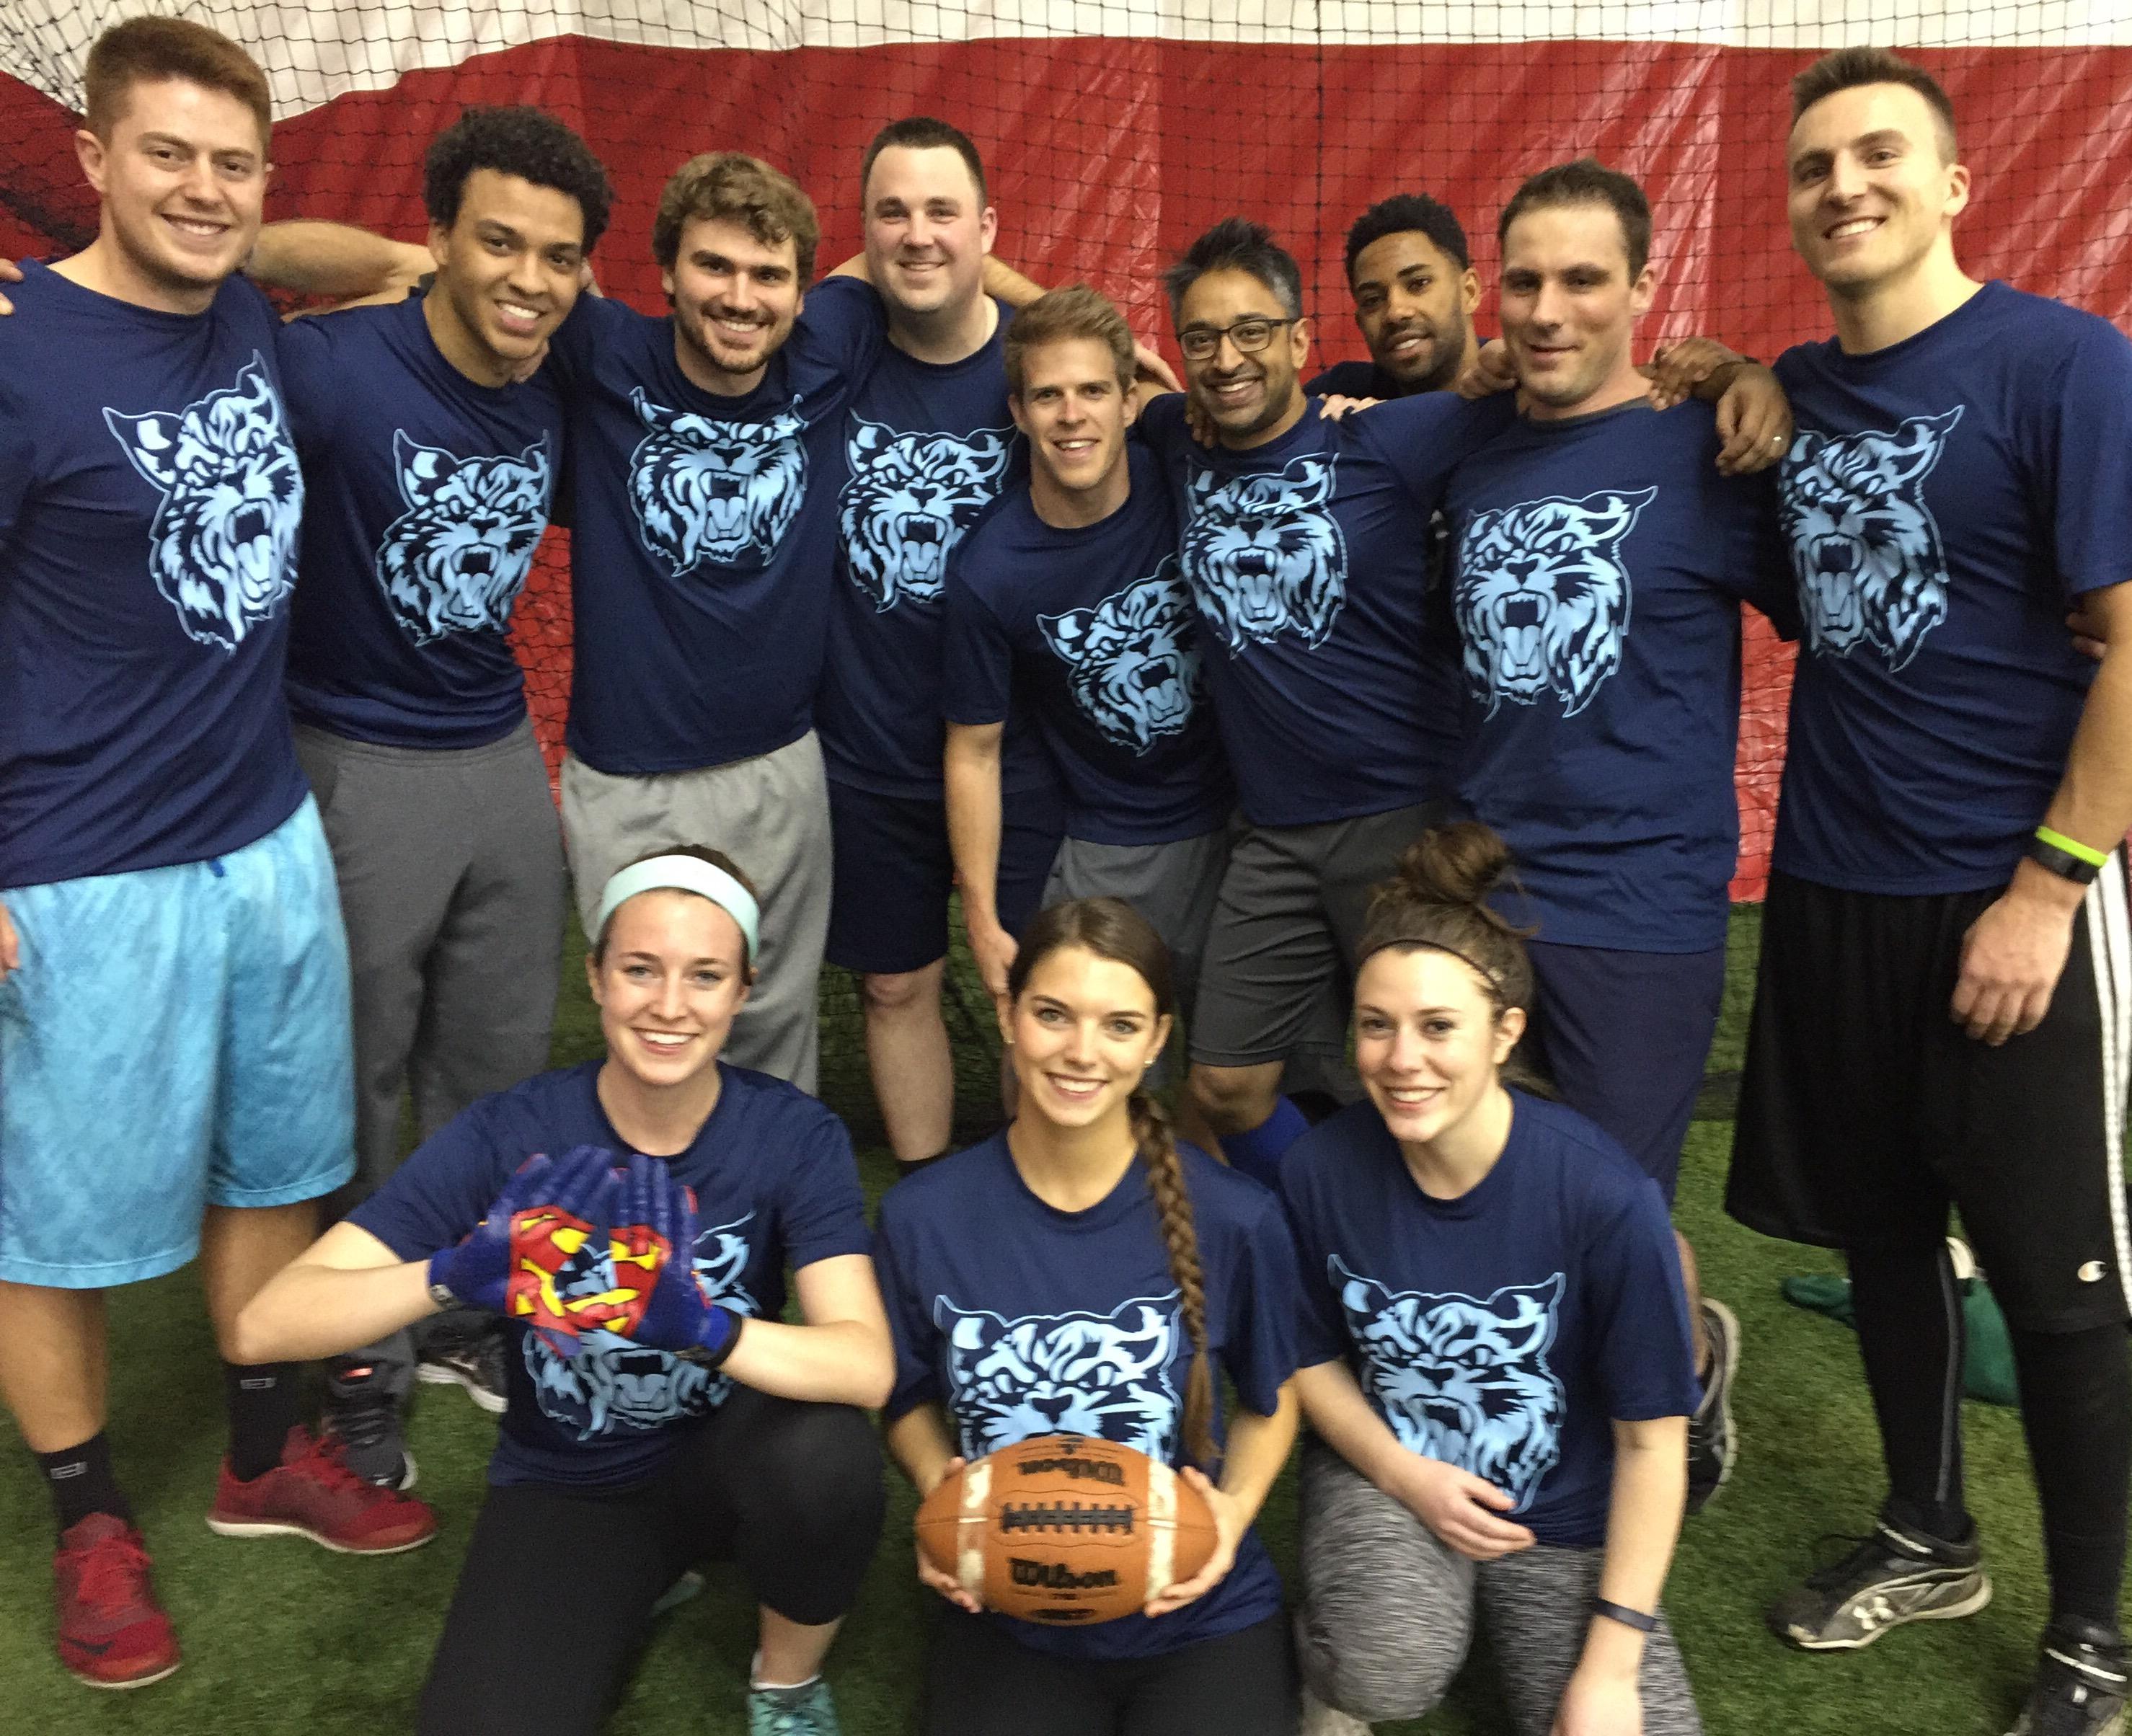 ge transportation flag football team t shirt photo - Football T Shirt Design Ideas